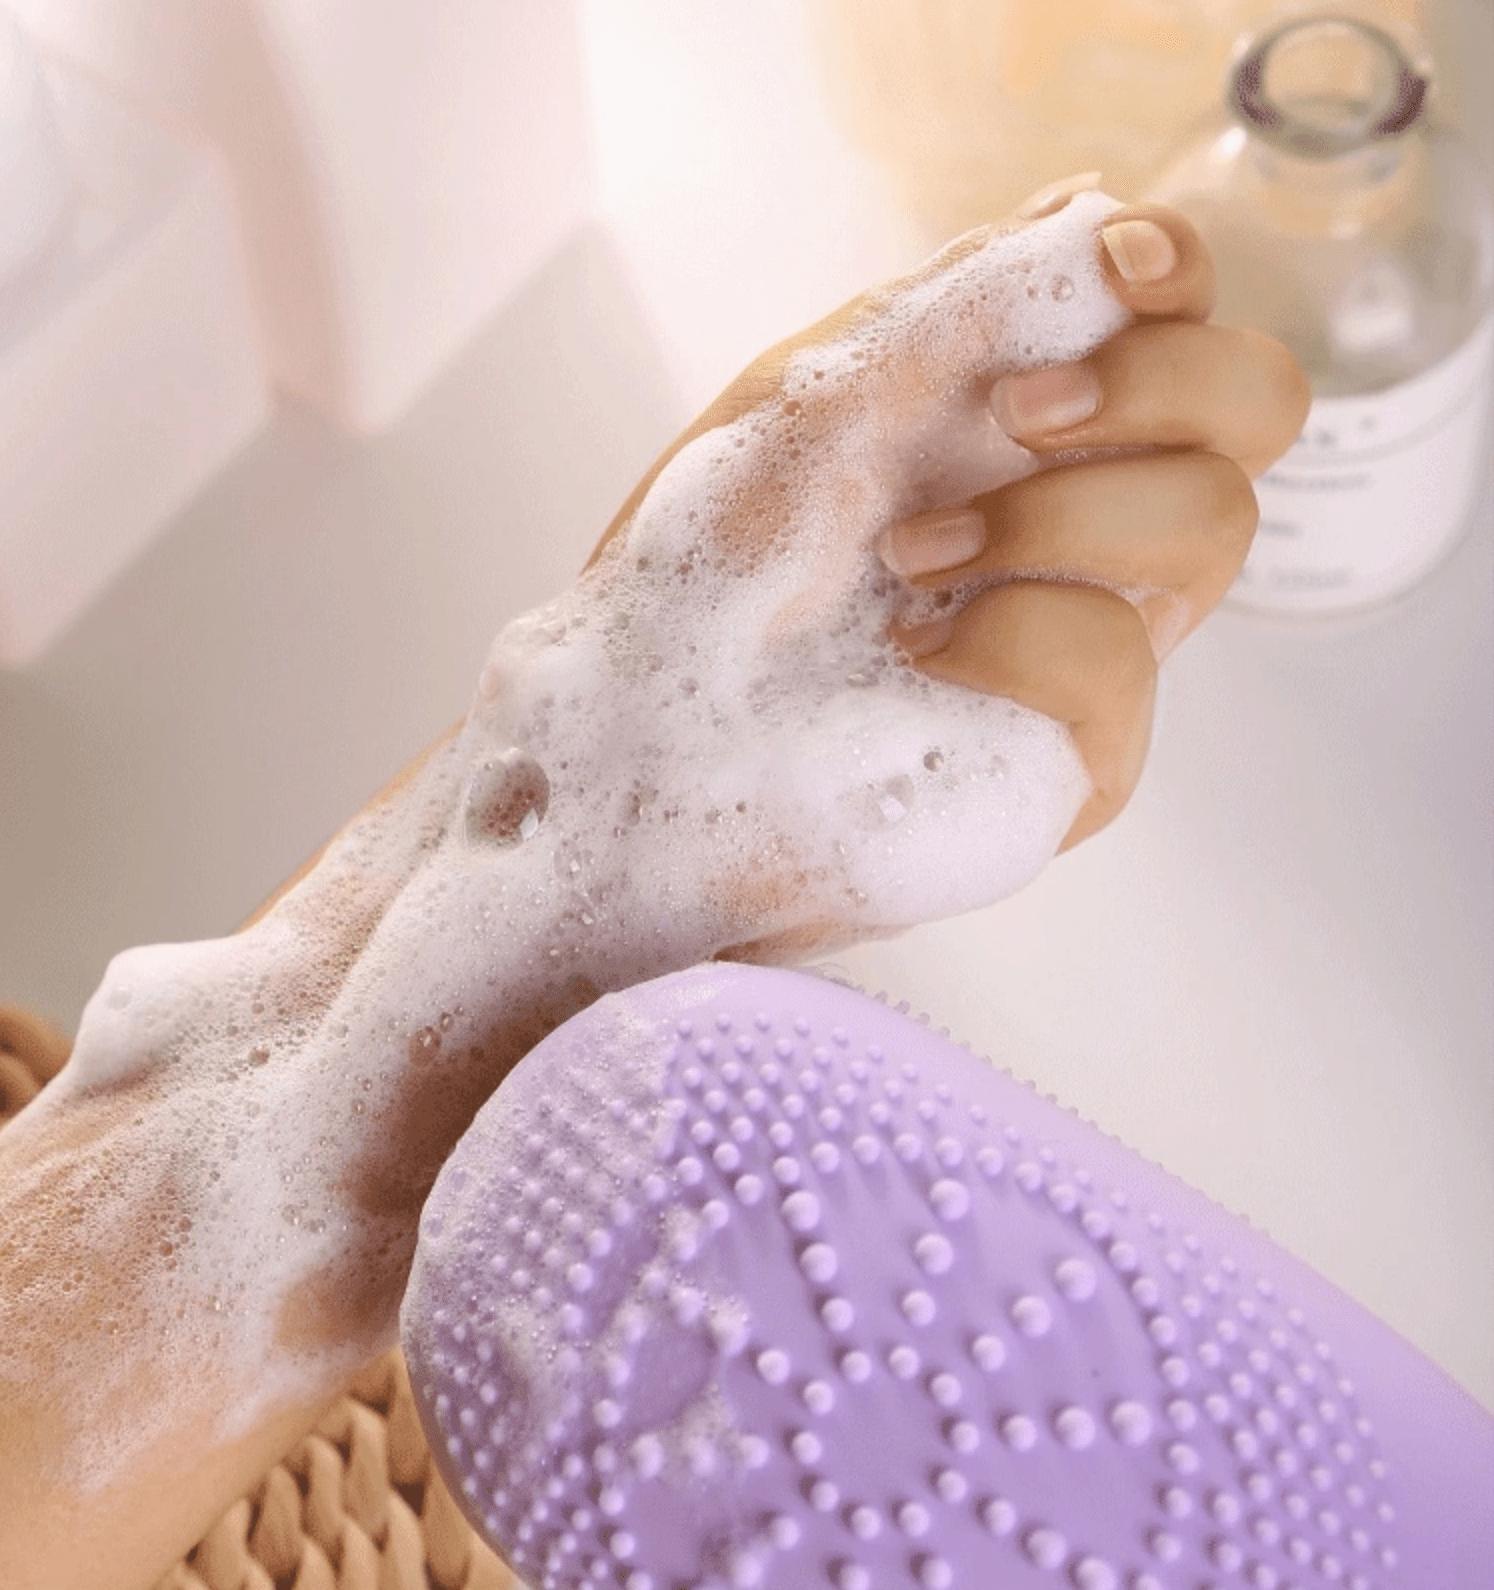 массажная щетка для тела, щетка для ванны, силиконовая щетка для тела, щетка для очистки кожы